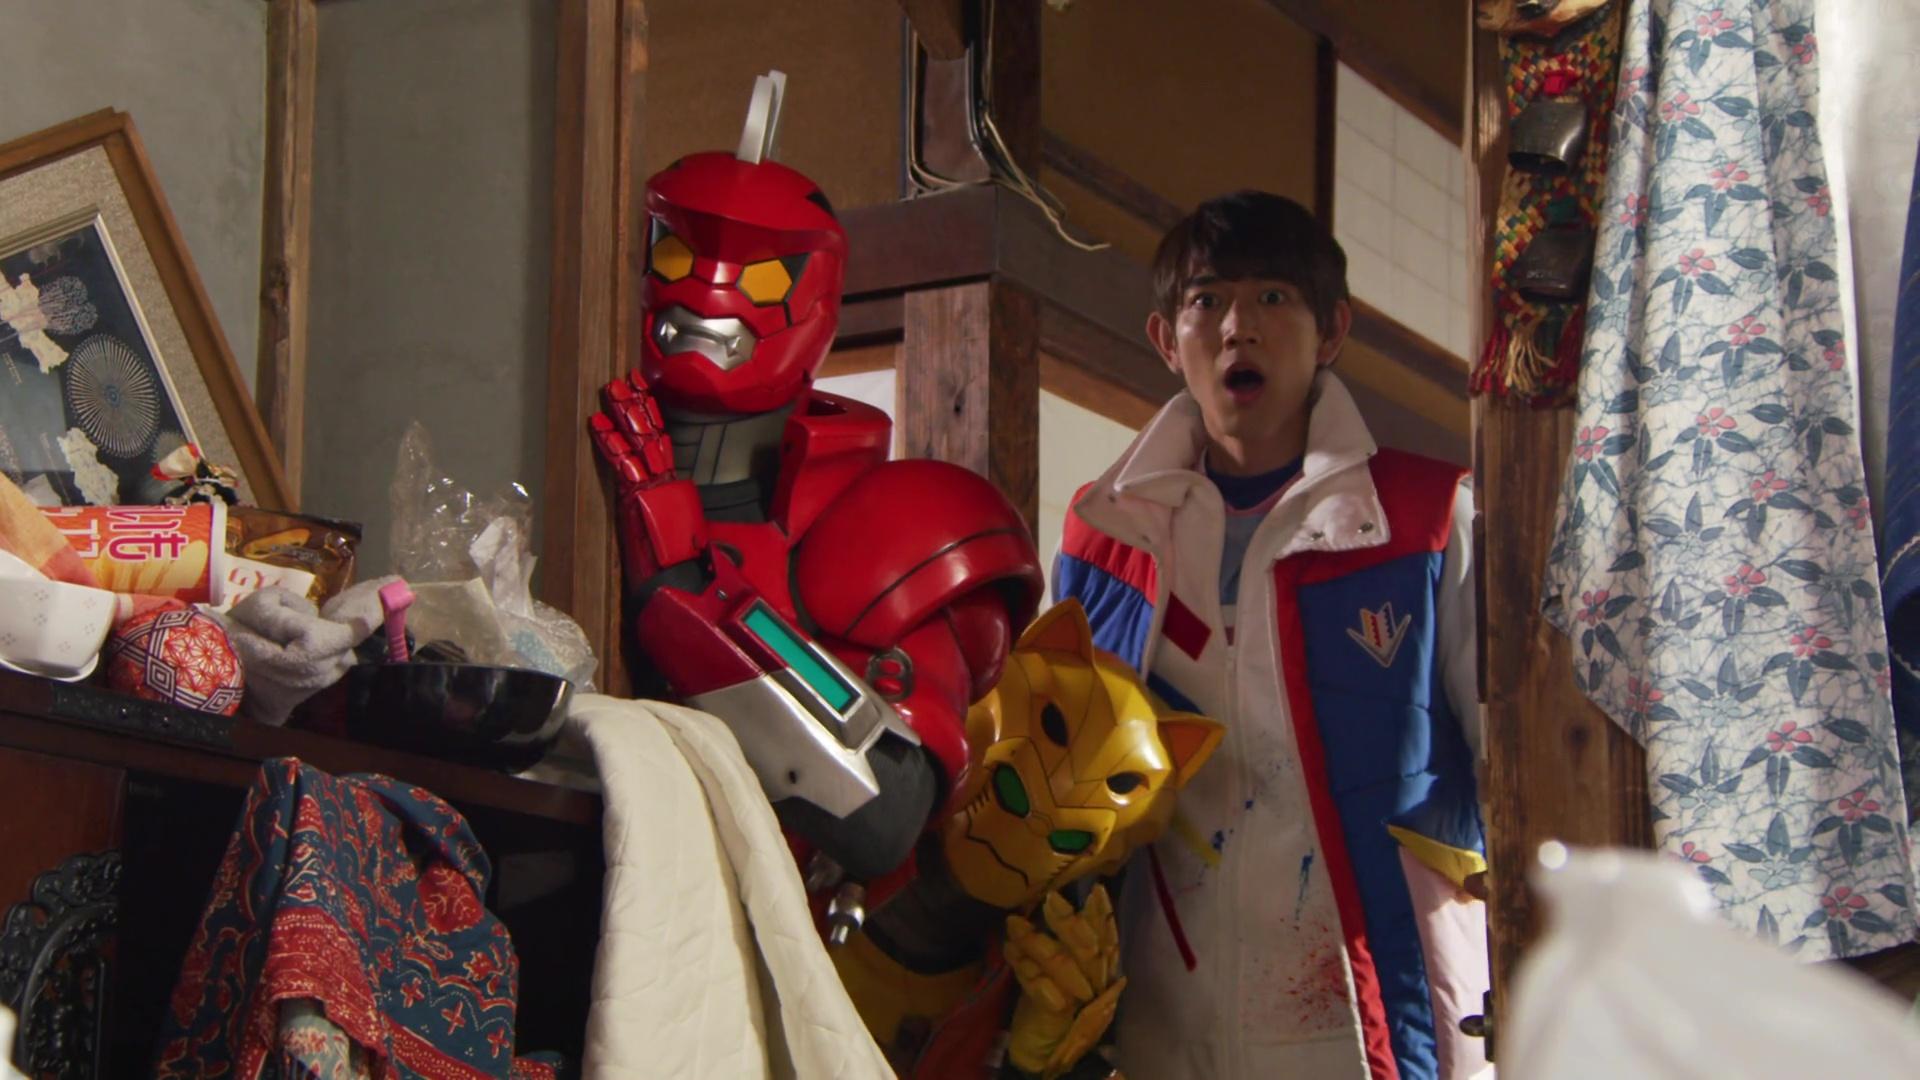 Kikai Sentai Zenkaiger Episode 6 Recap